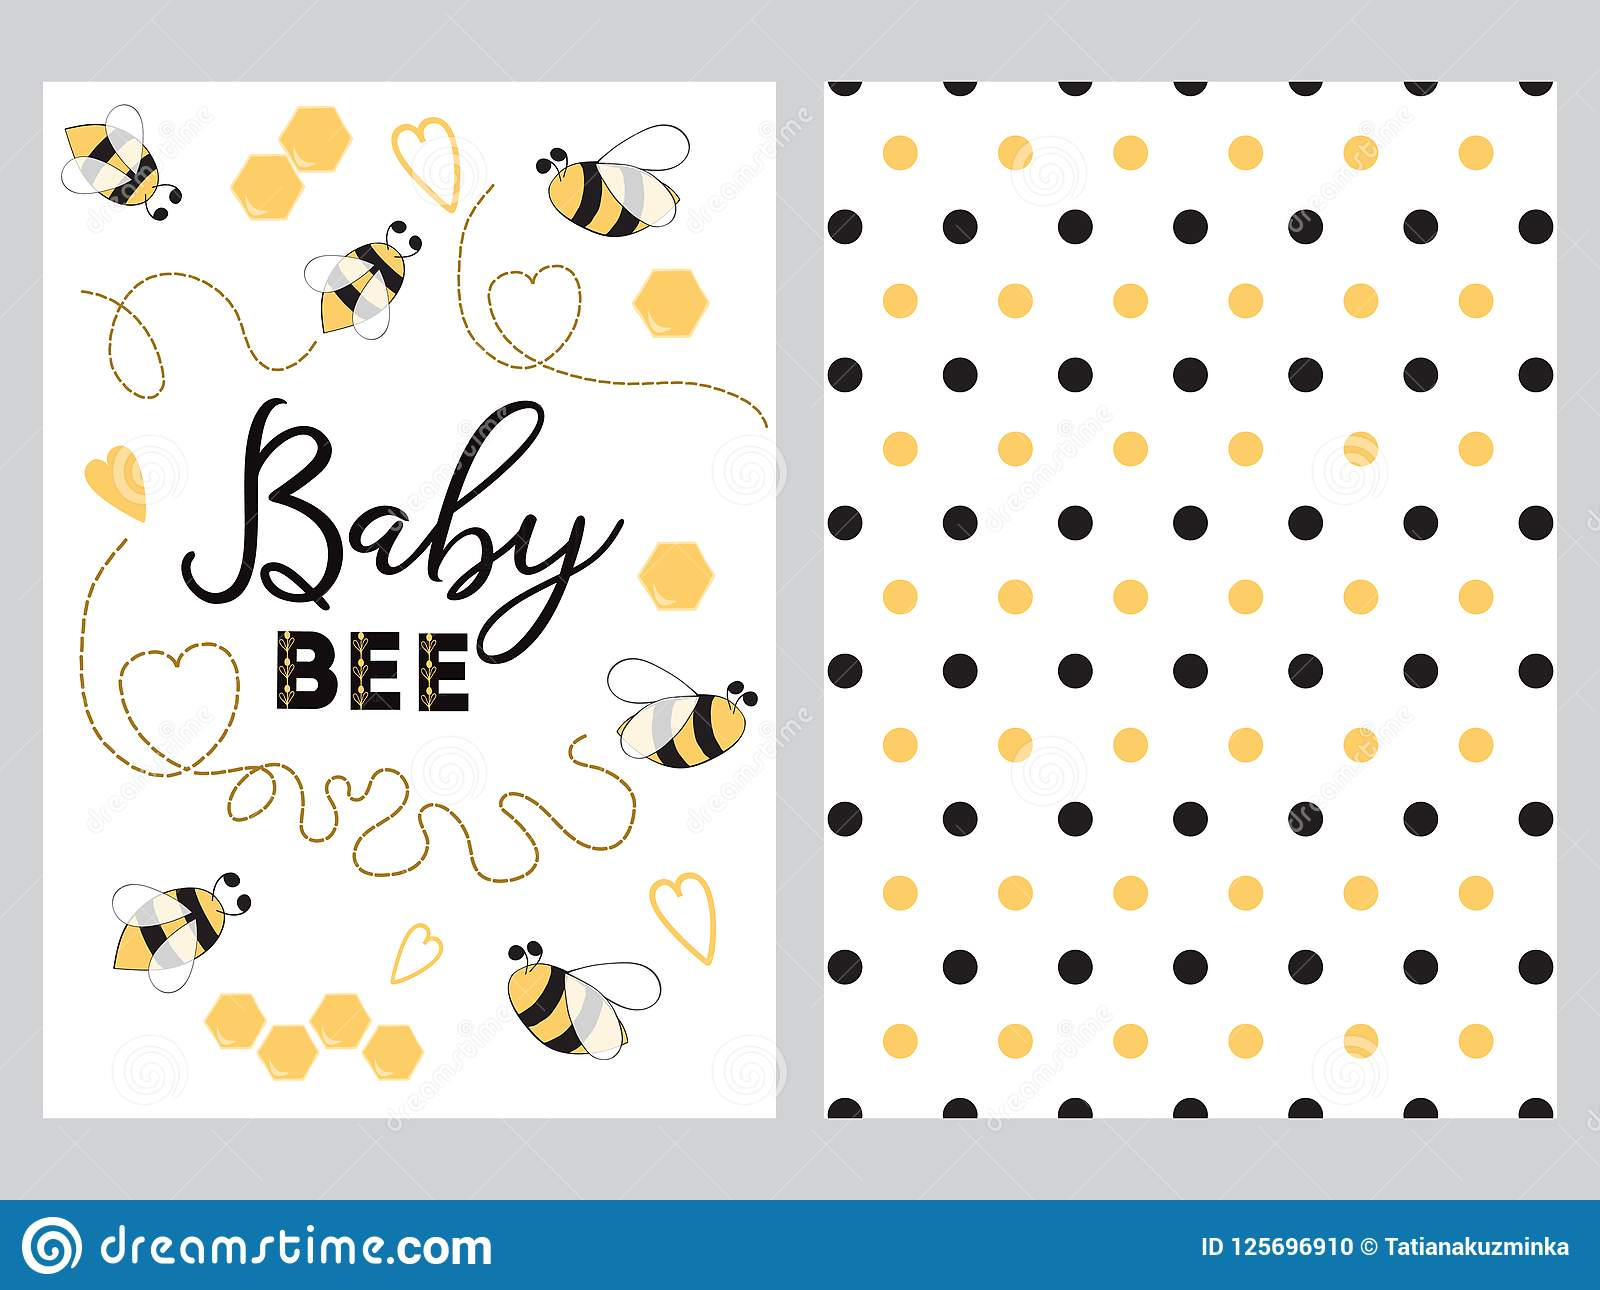 newborn banner design text baby bee decorated bee heart honey sweet